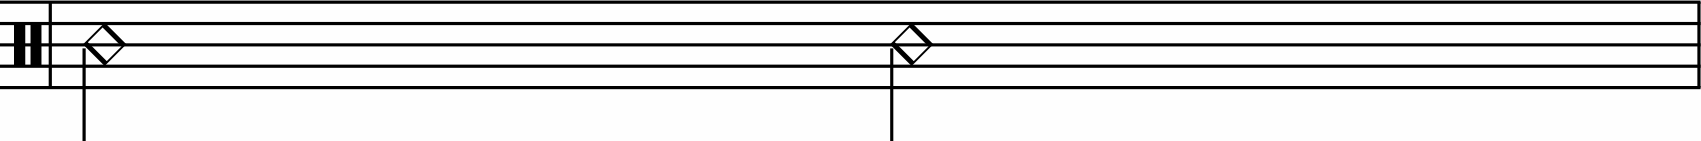 Half note rhythm example.